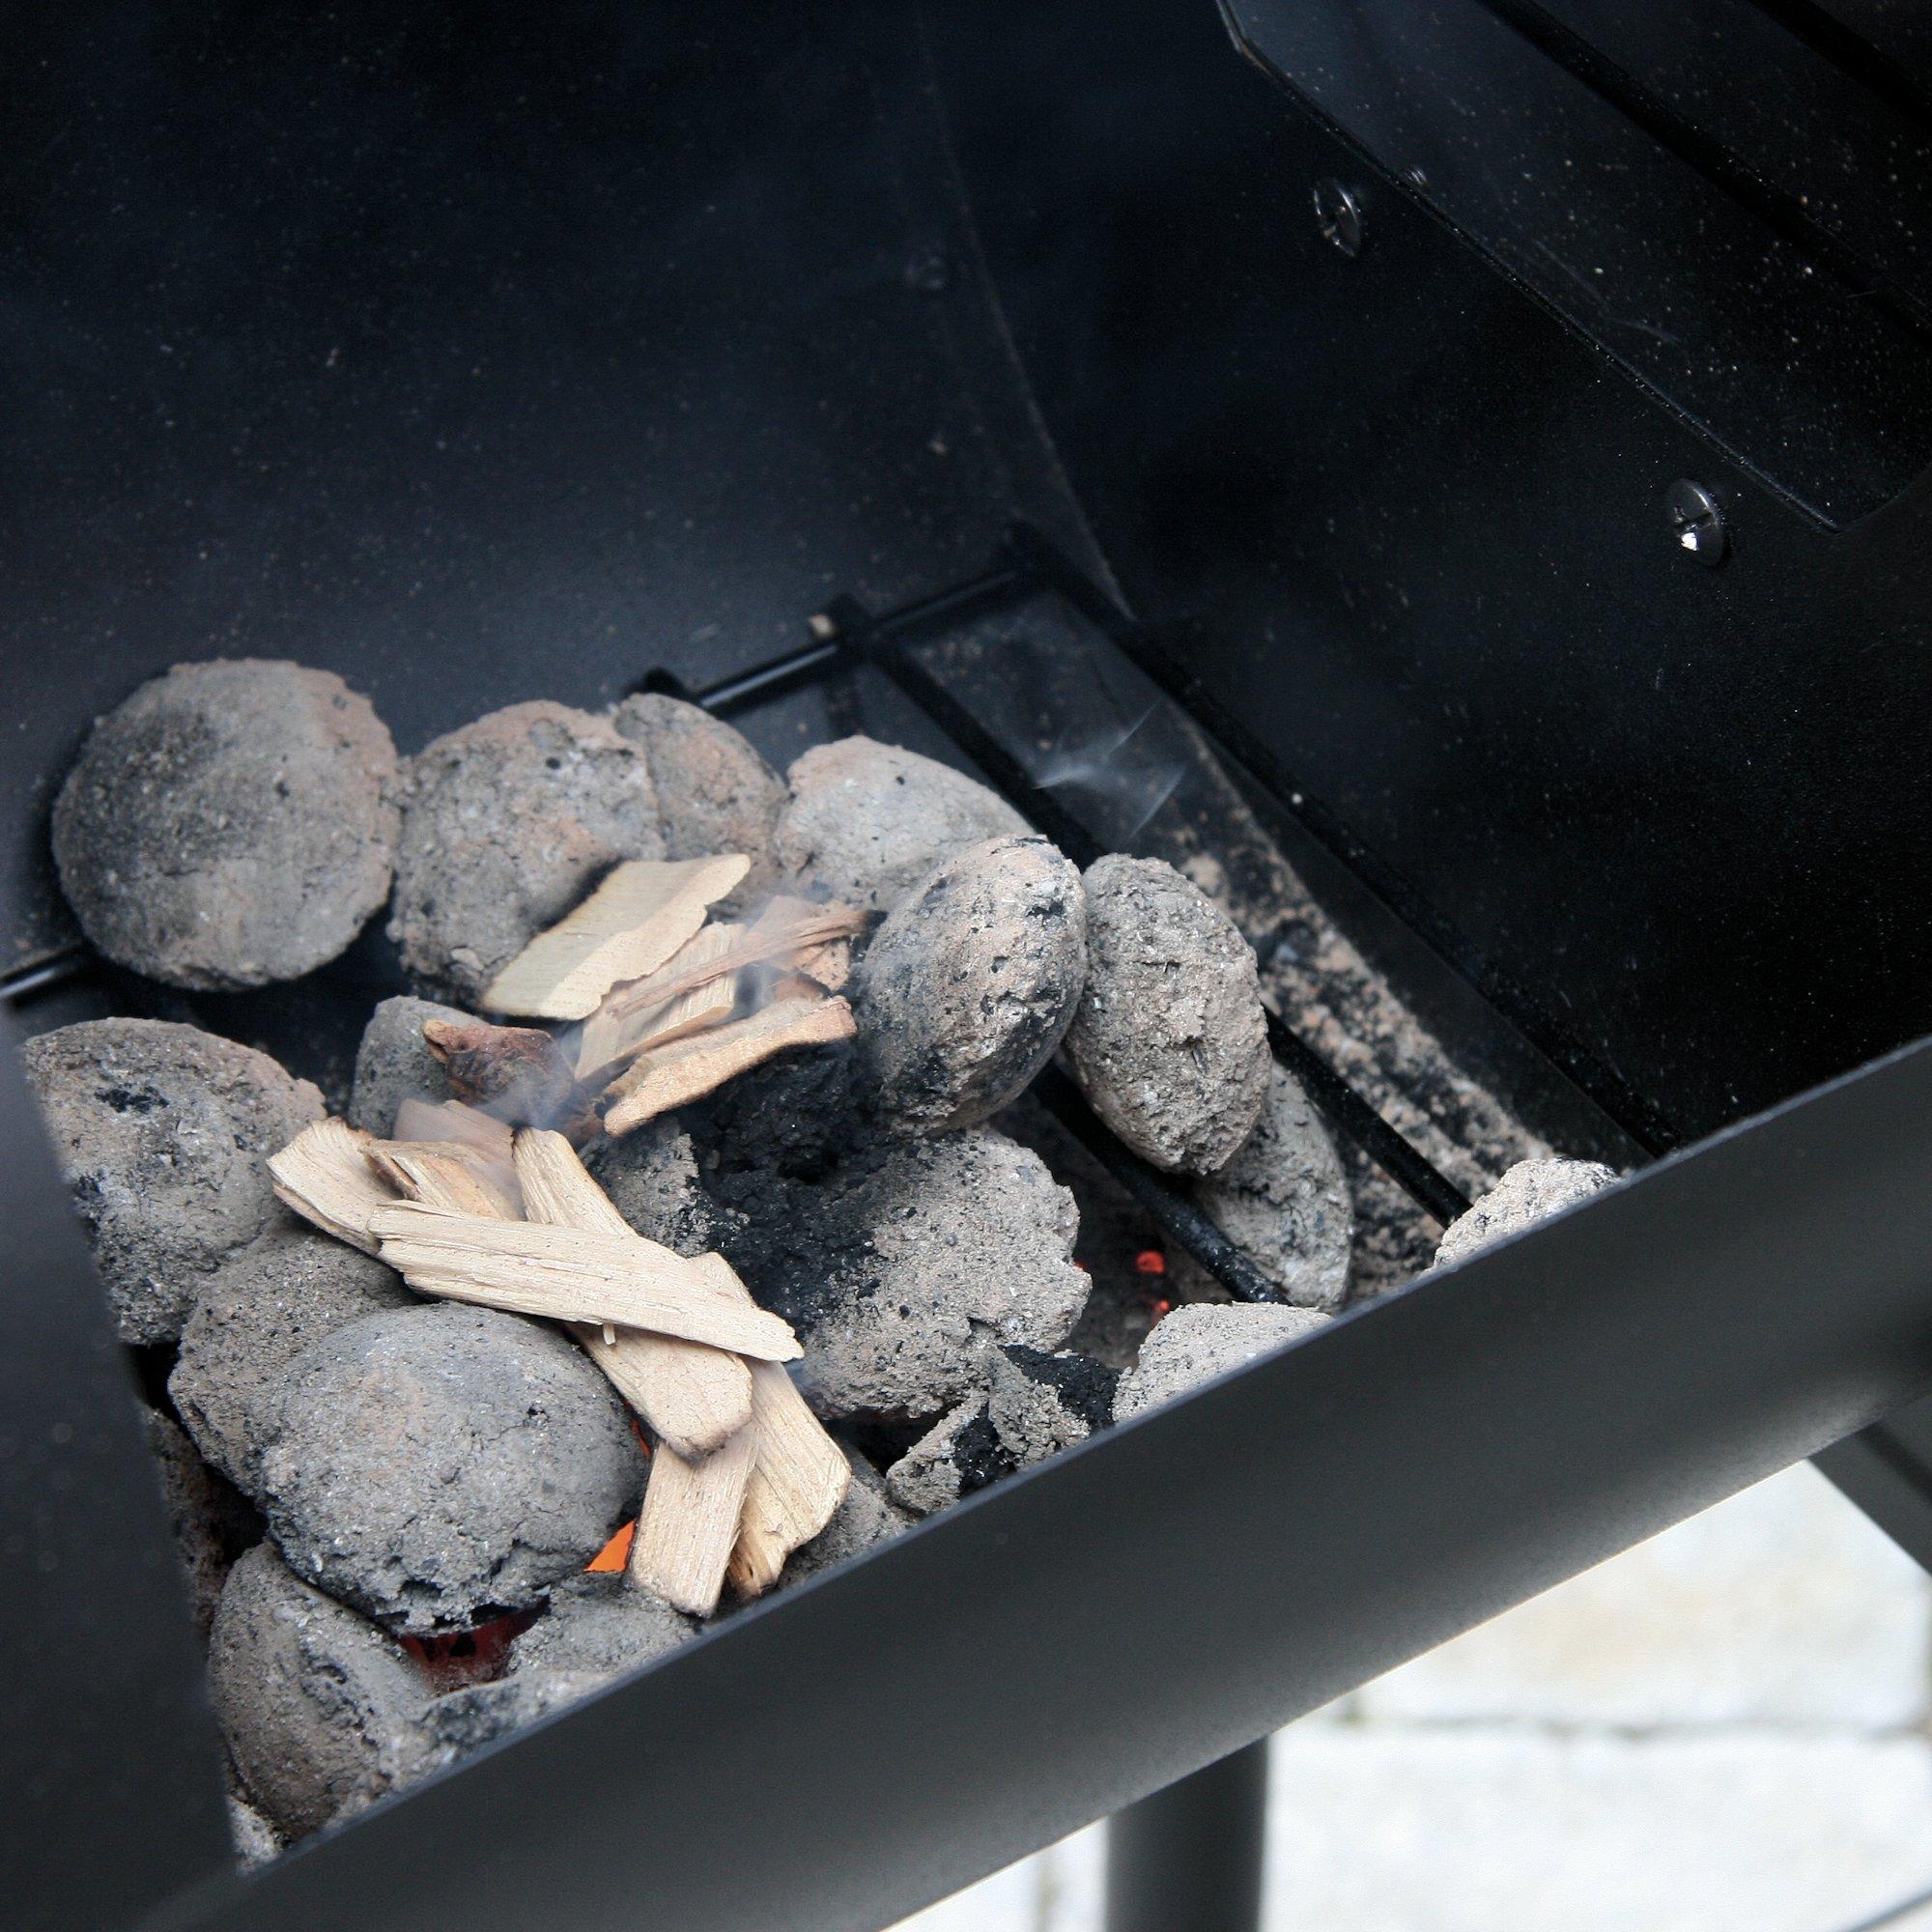 BBQ-Toro Holzkohle Grillwagen Magnolia